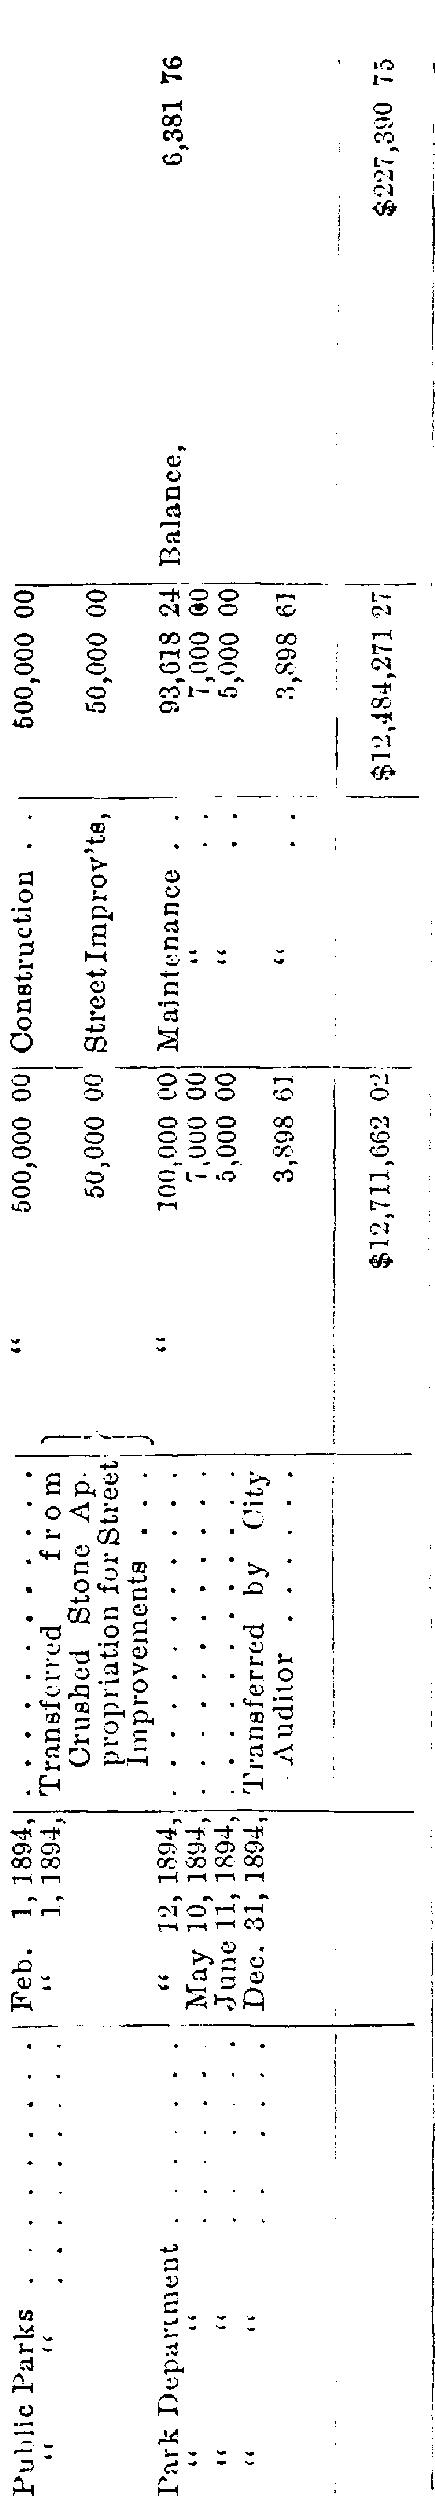 [merged small][merged small][merged small][merged small][ocr errors][merged small][merged small][merged small][merged small][merged small][merged small][merged small][merged small][merged small][merged small][merged small][merged small]